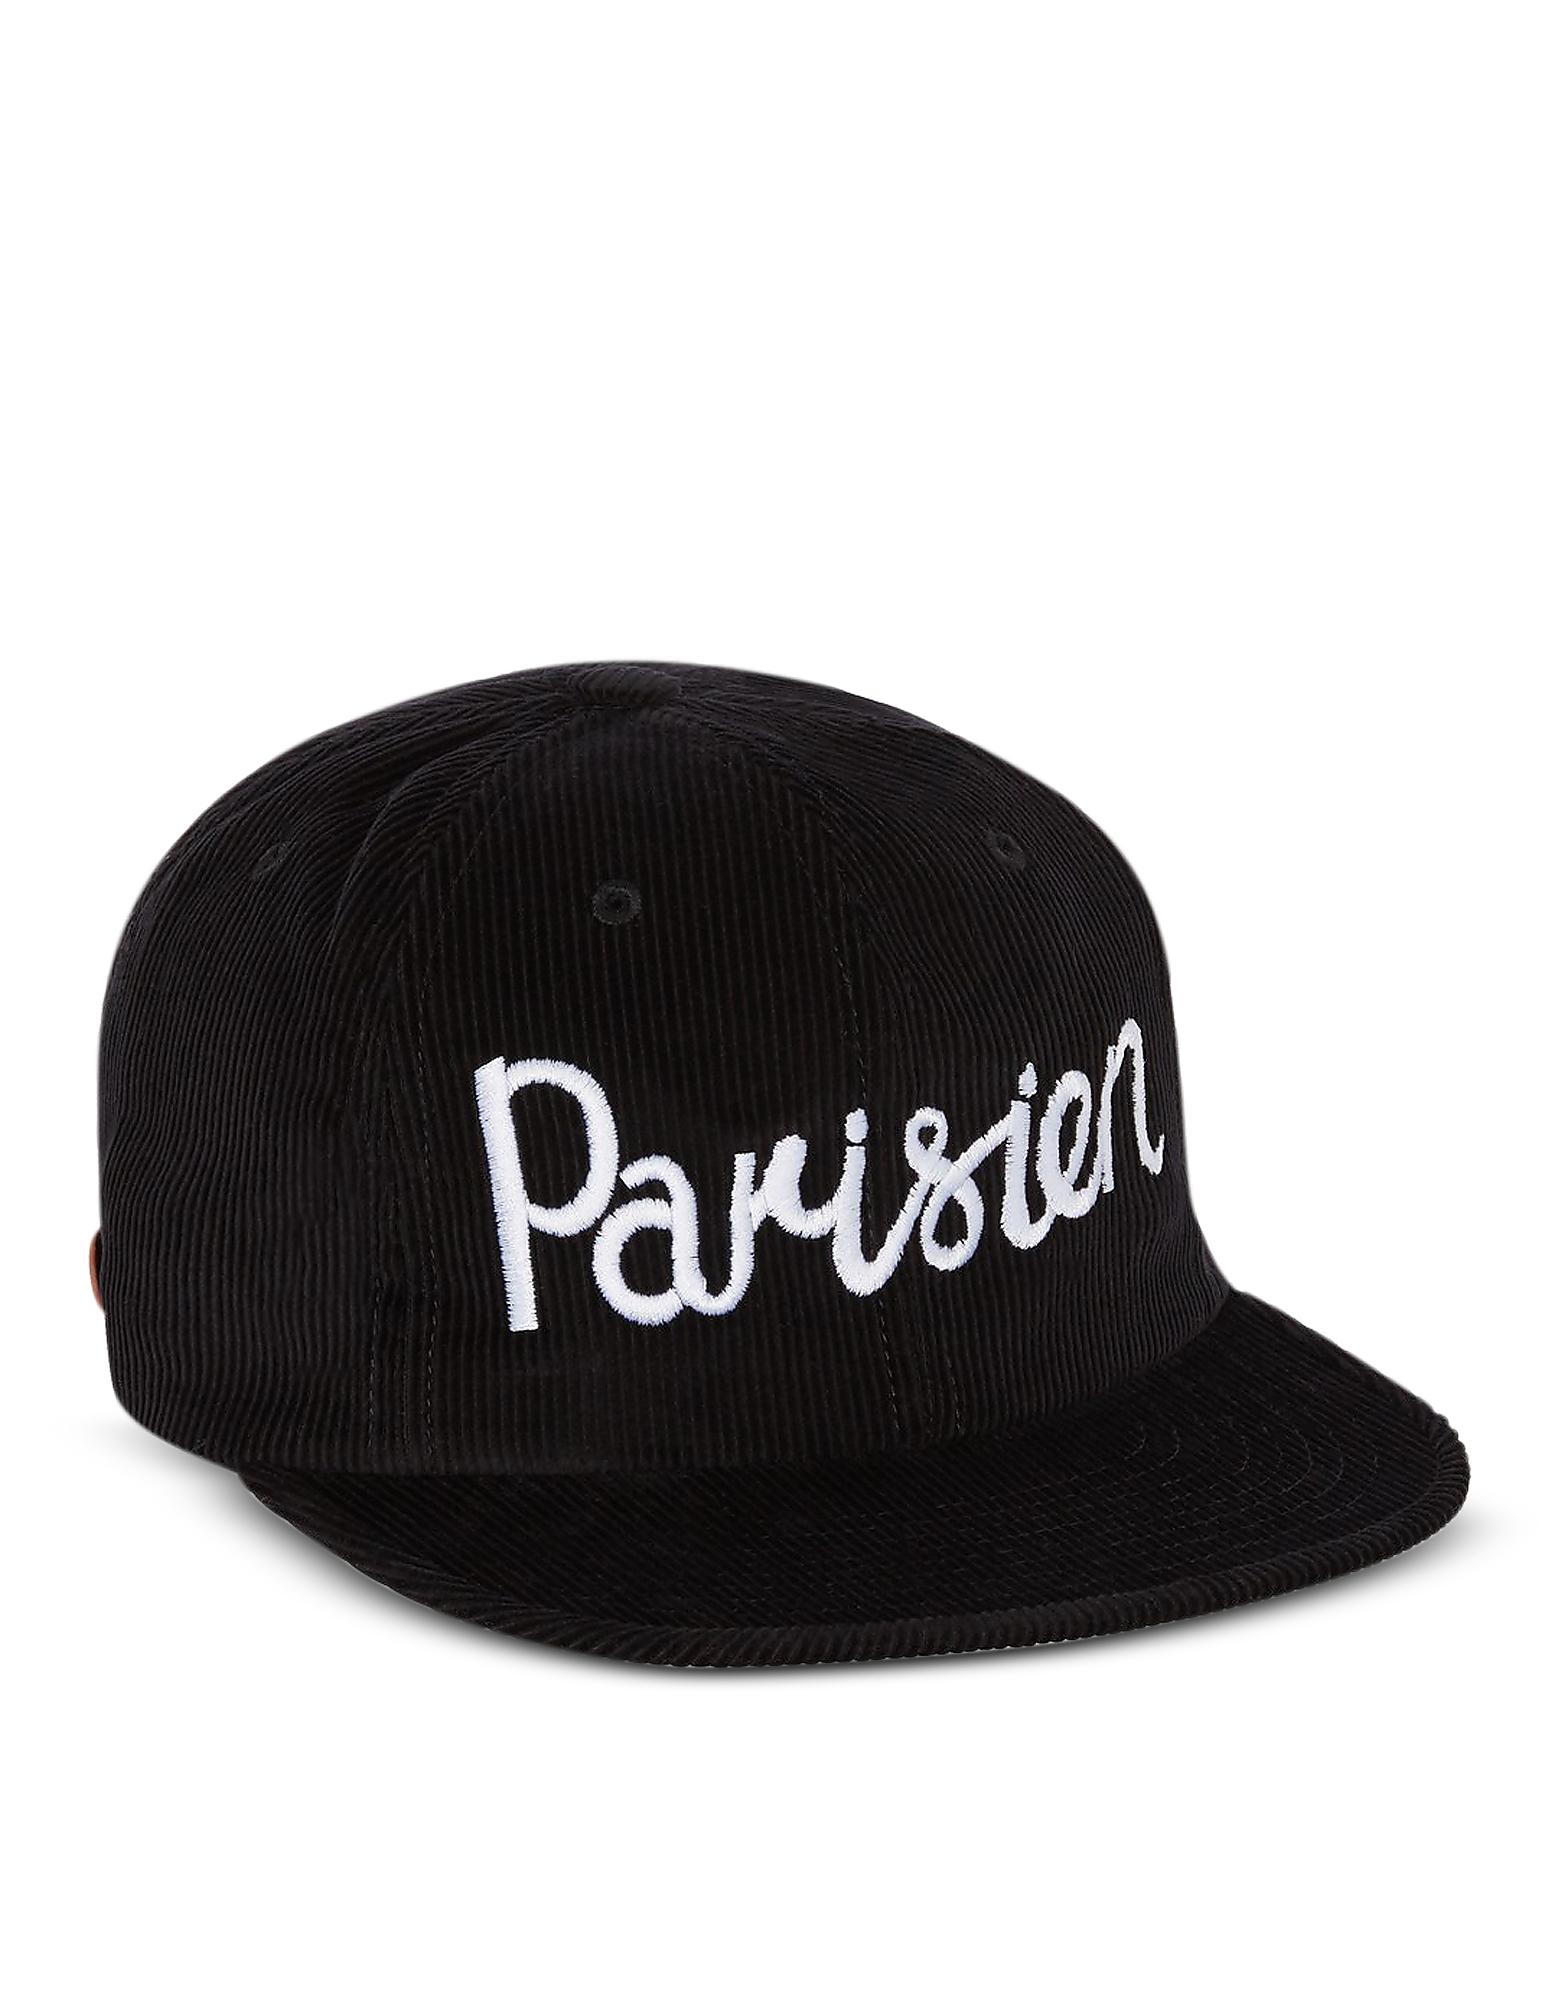 Corduroy Parisien - Черная Бейсболка